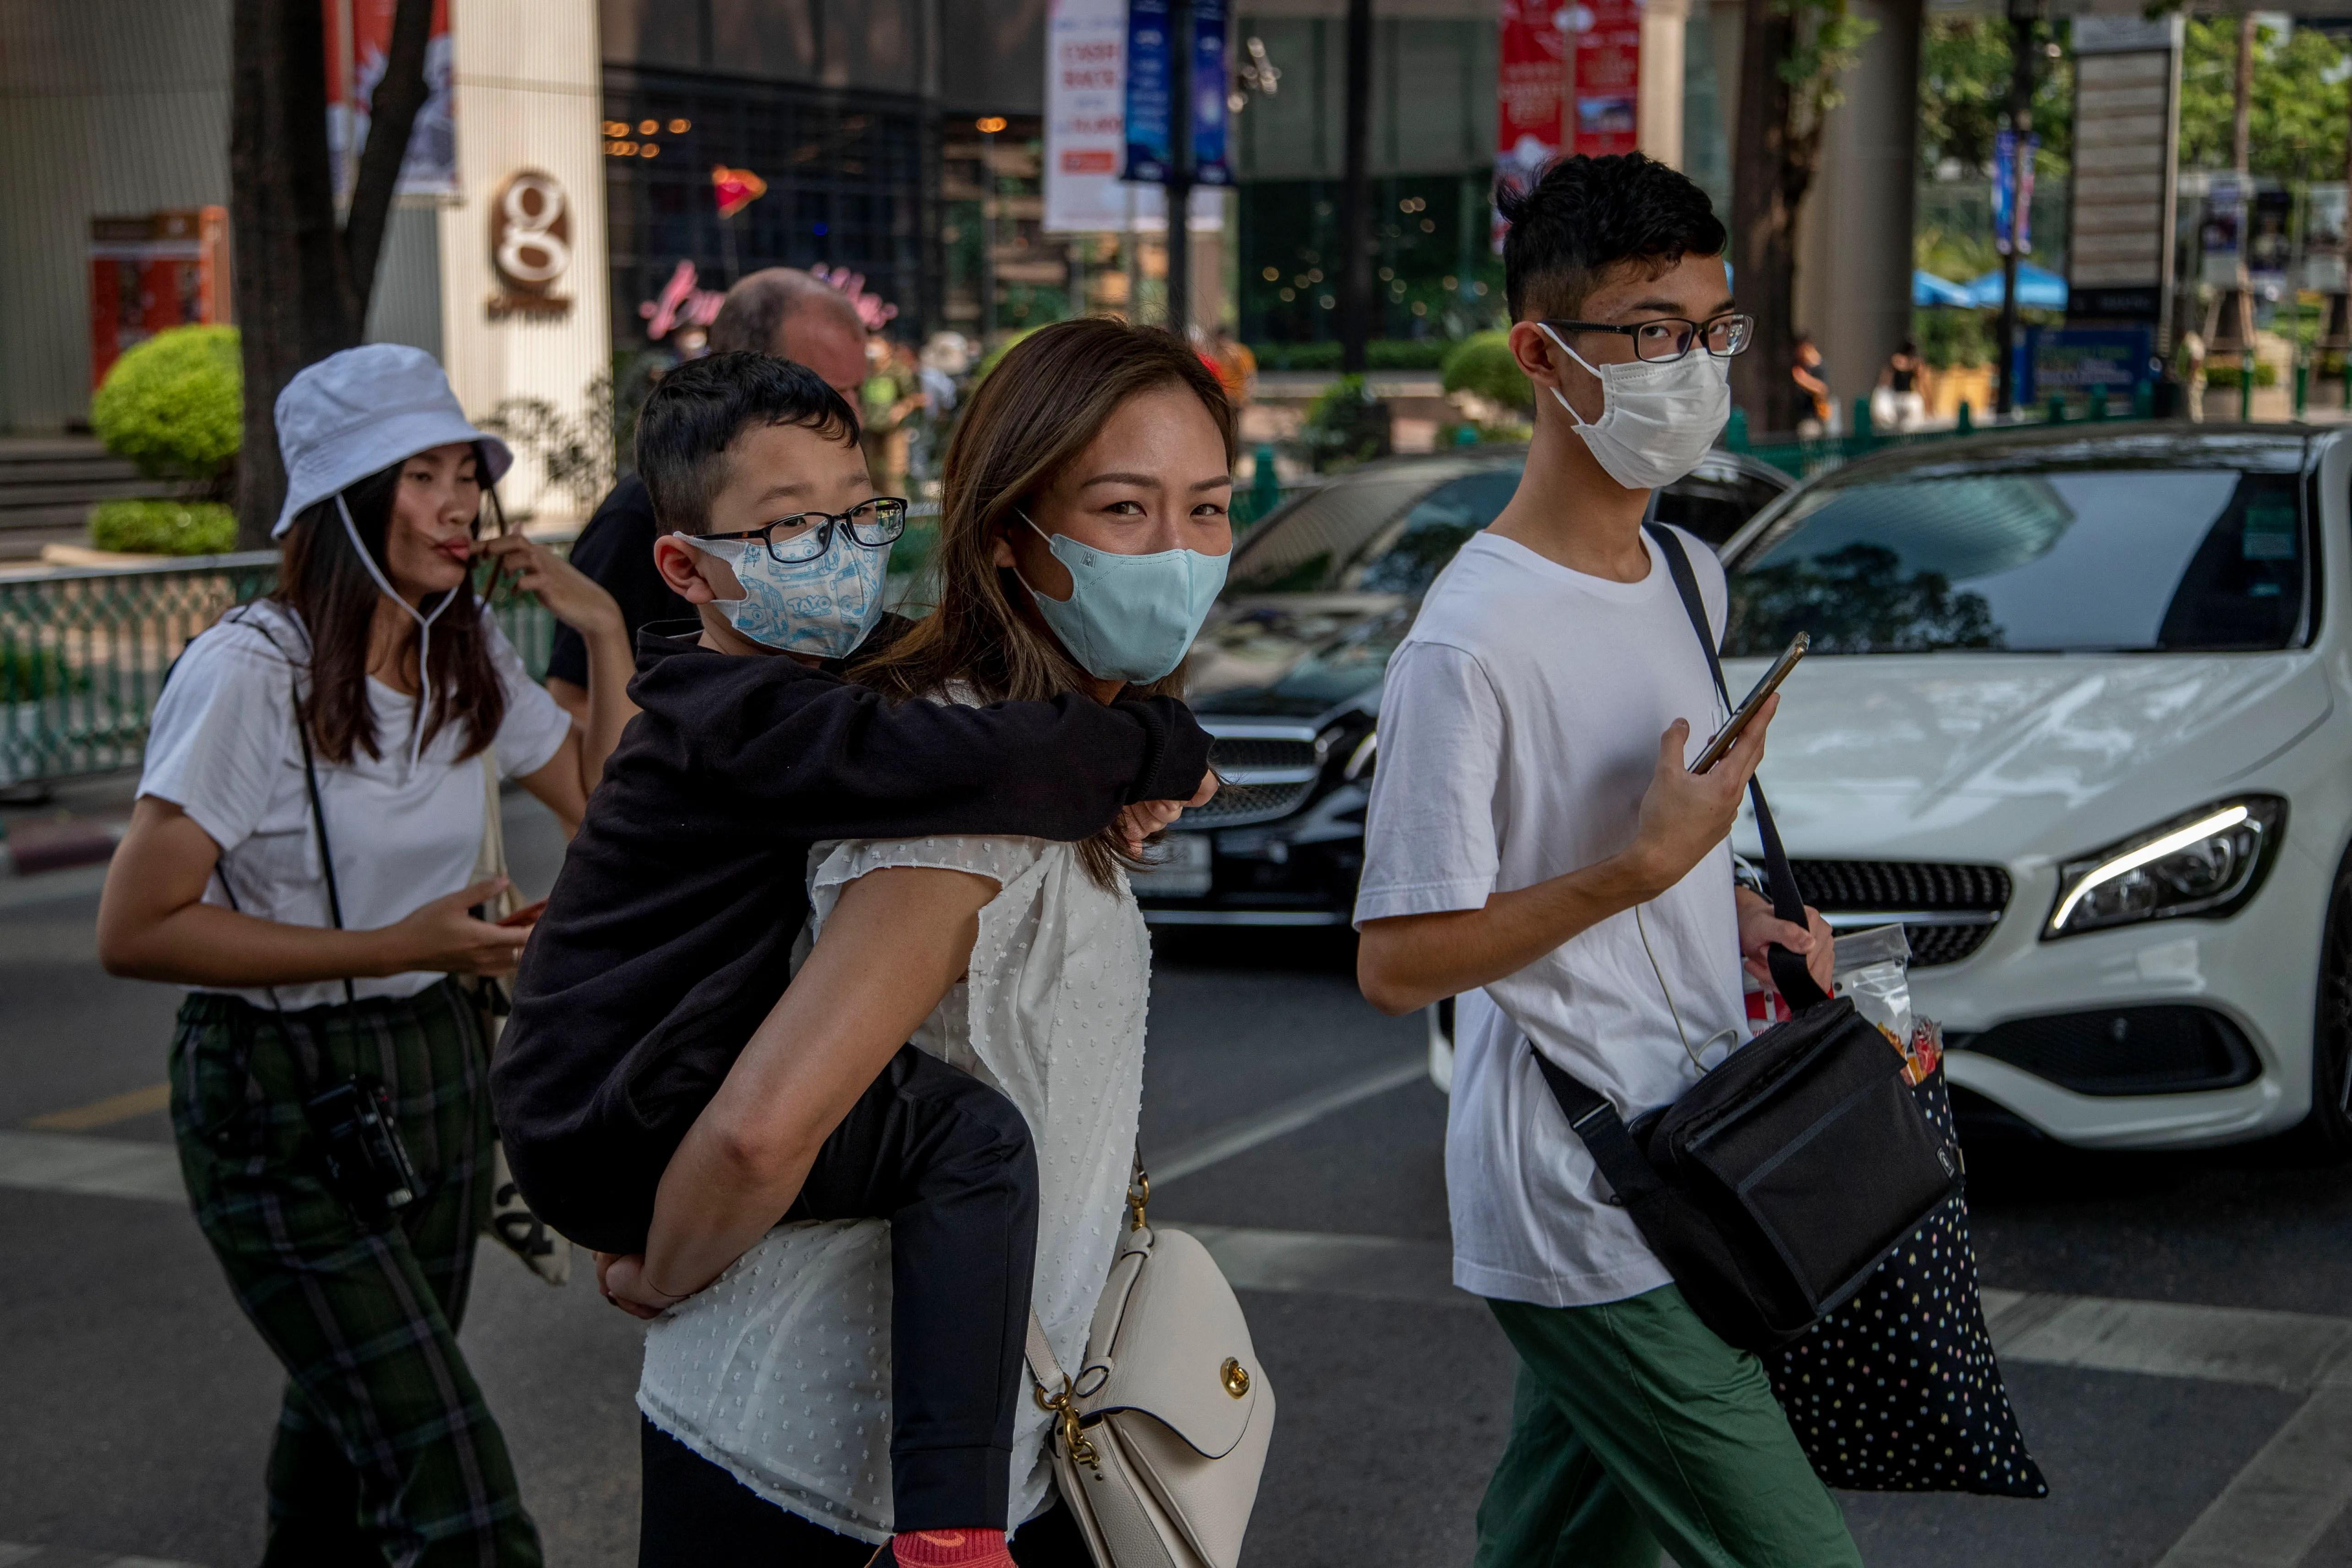 Wisconsin no longer testing anyone for global Wuhan coronavirus